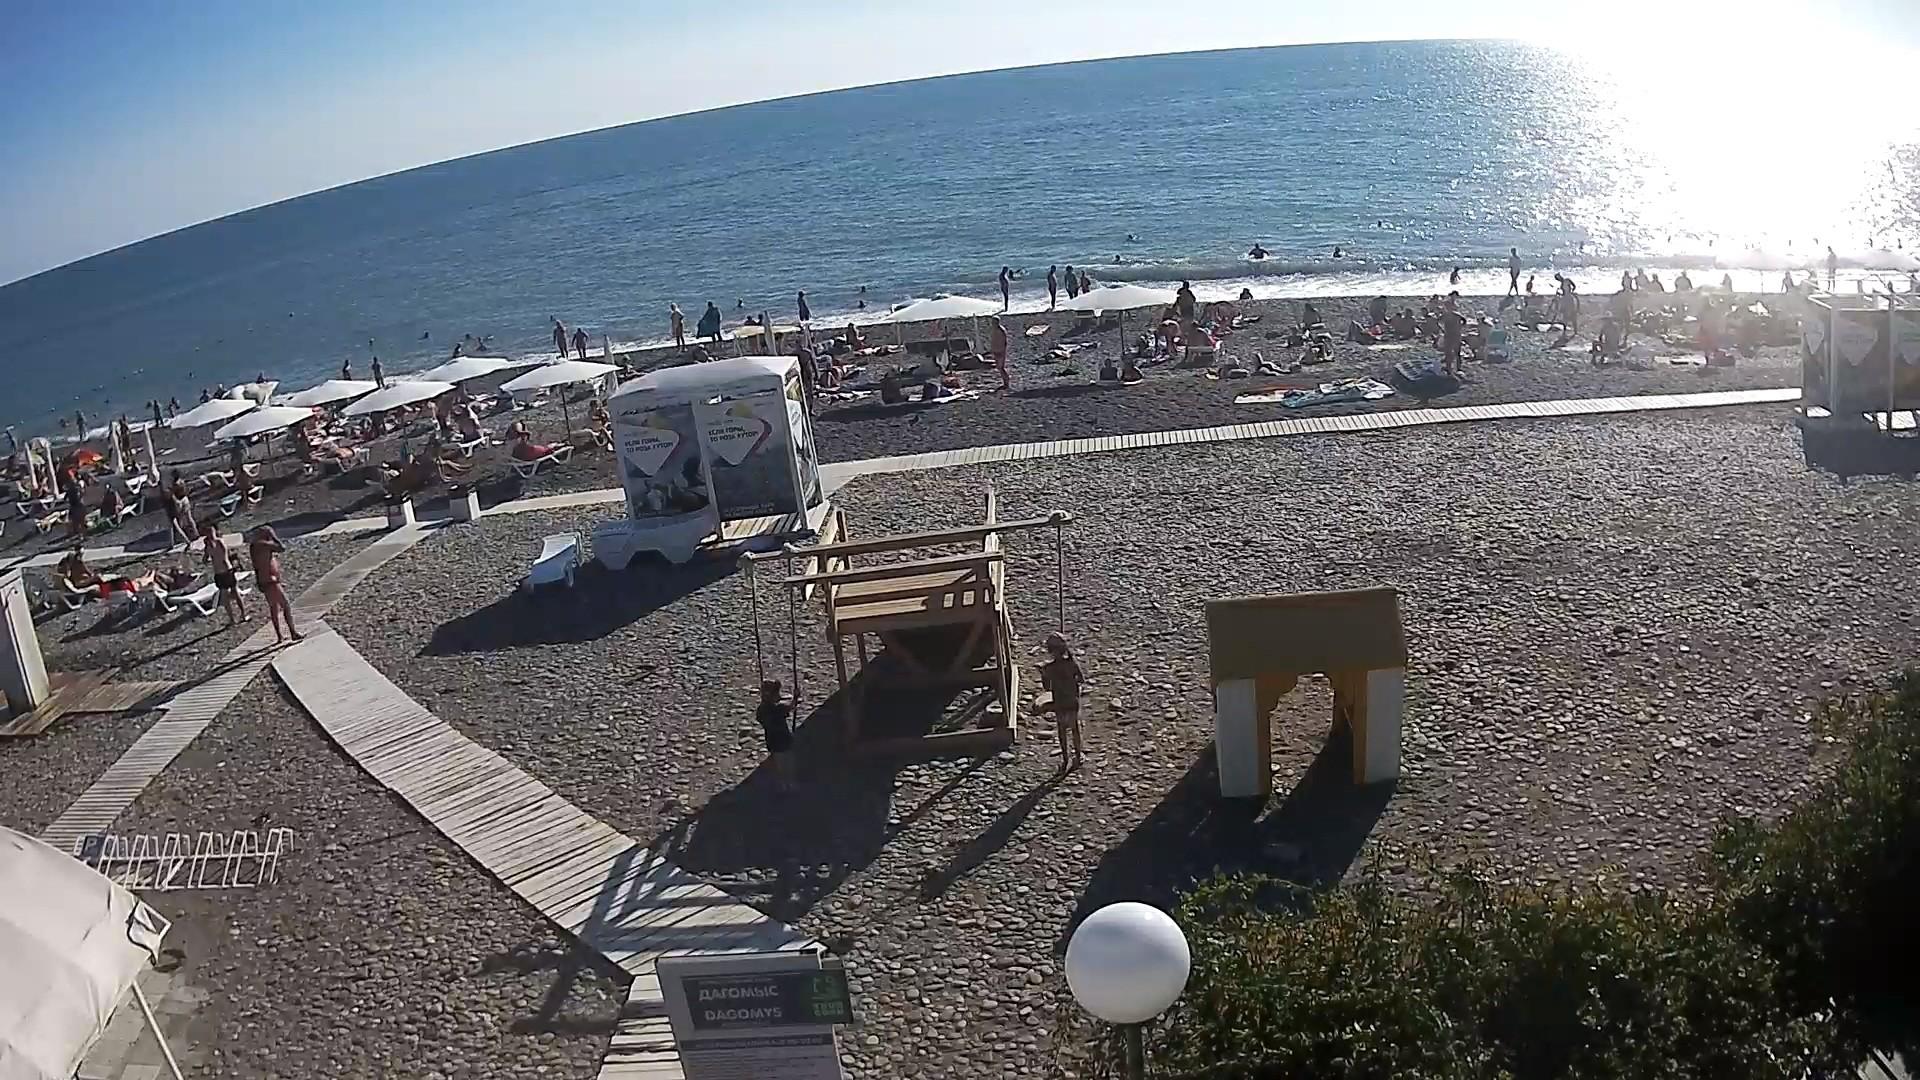 Веб-камера на пляже в Дагомысе, вид на причал